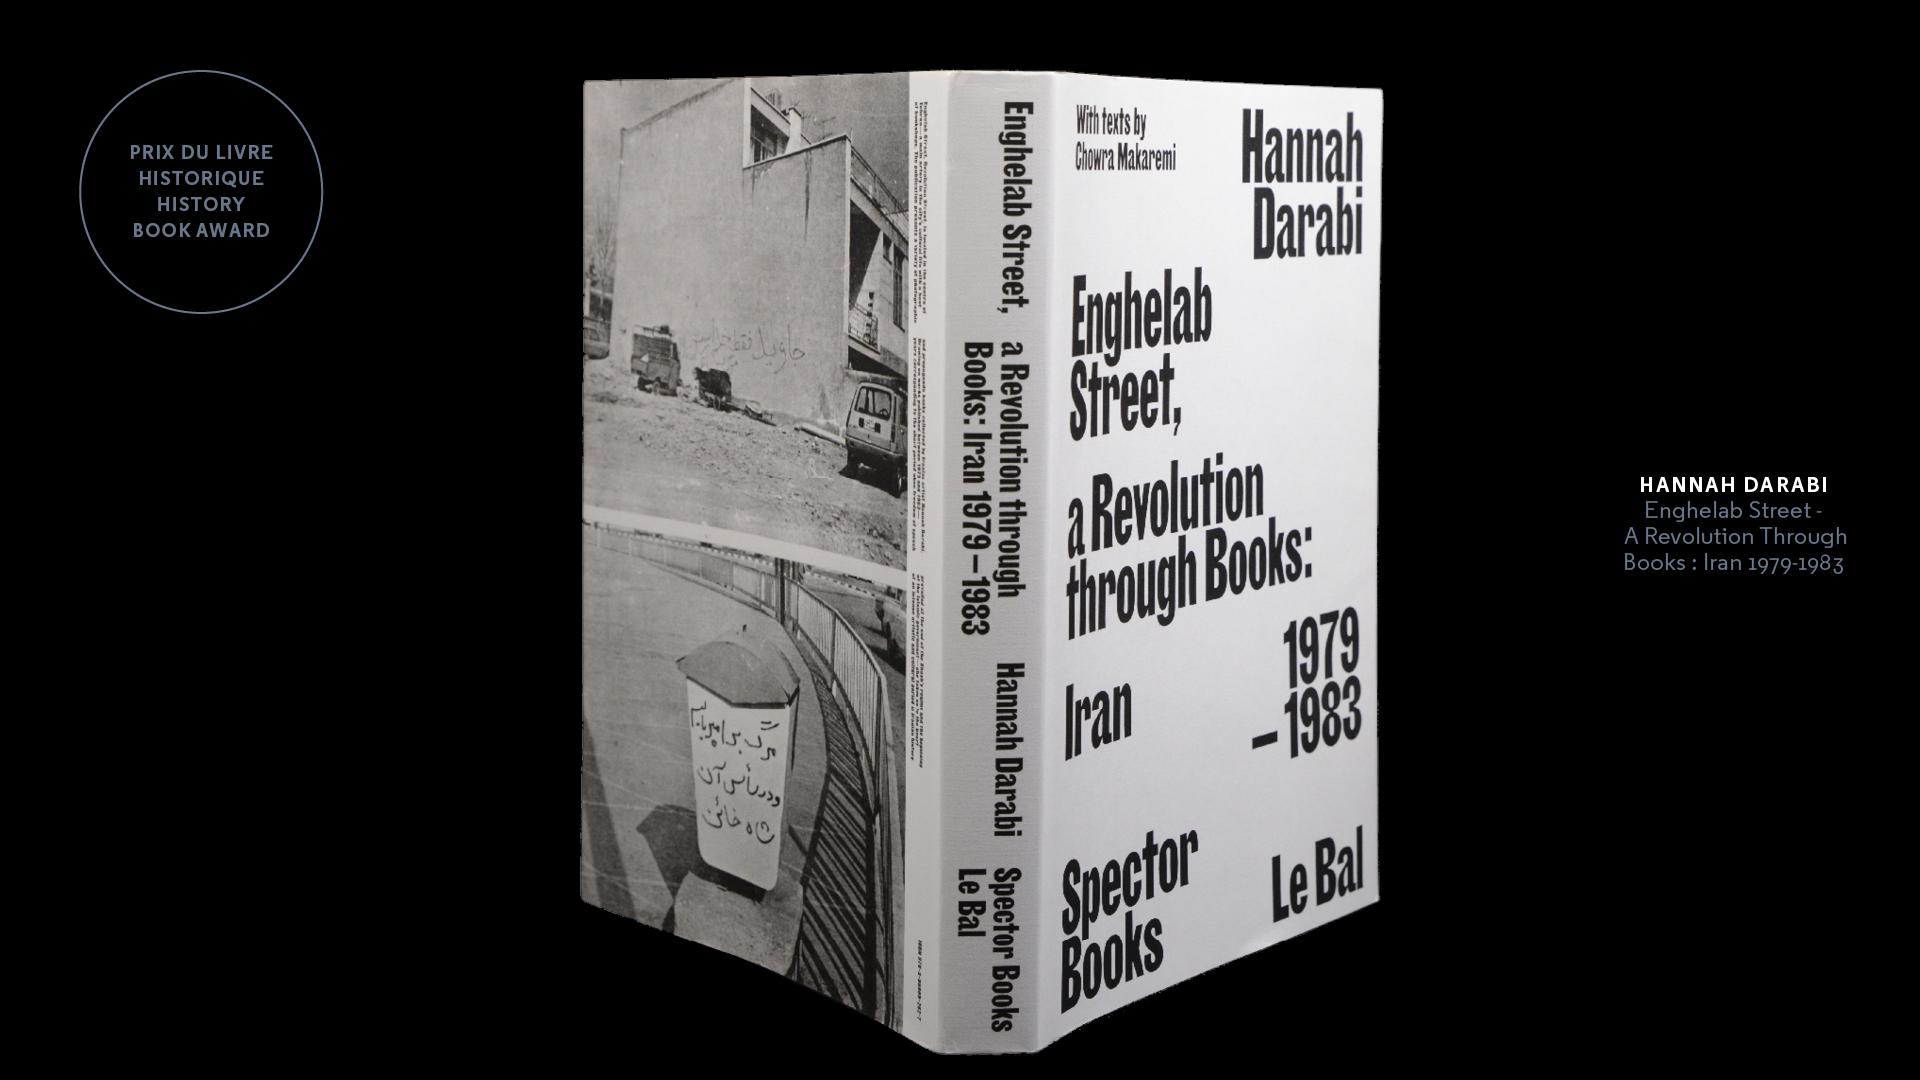 Winner of the Historical Photobook Award:  Hannah Darabi  Enghelab   Street - A Revolution Through Books: Iran 1979-1983   Publishers: co ed. Spector Books & Le Bal. Graphic Design: Fabian Bremer and Pascal Storz